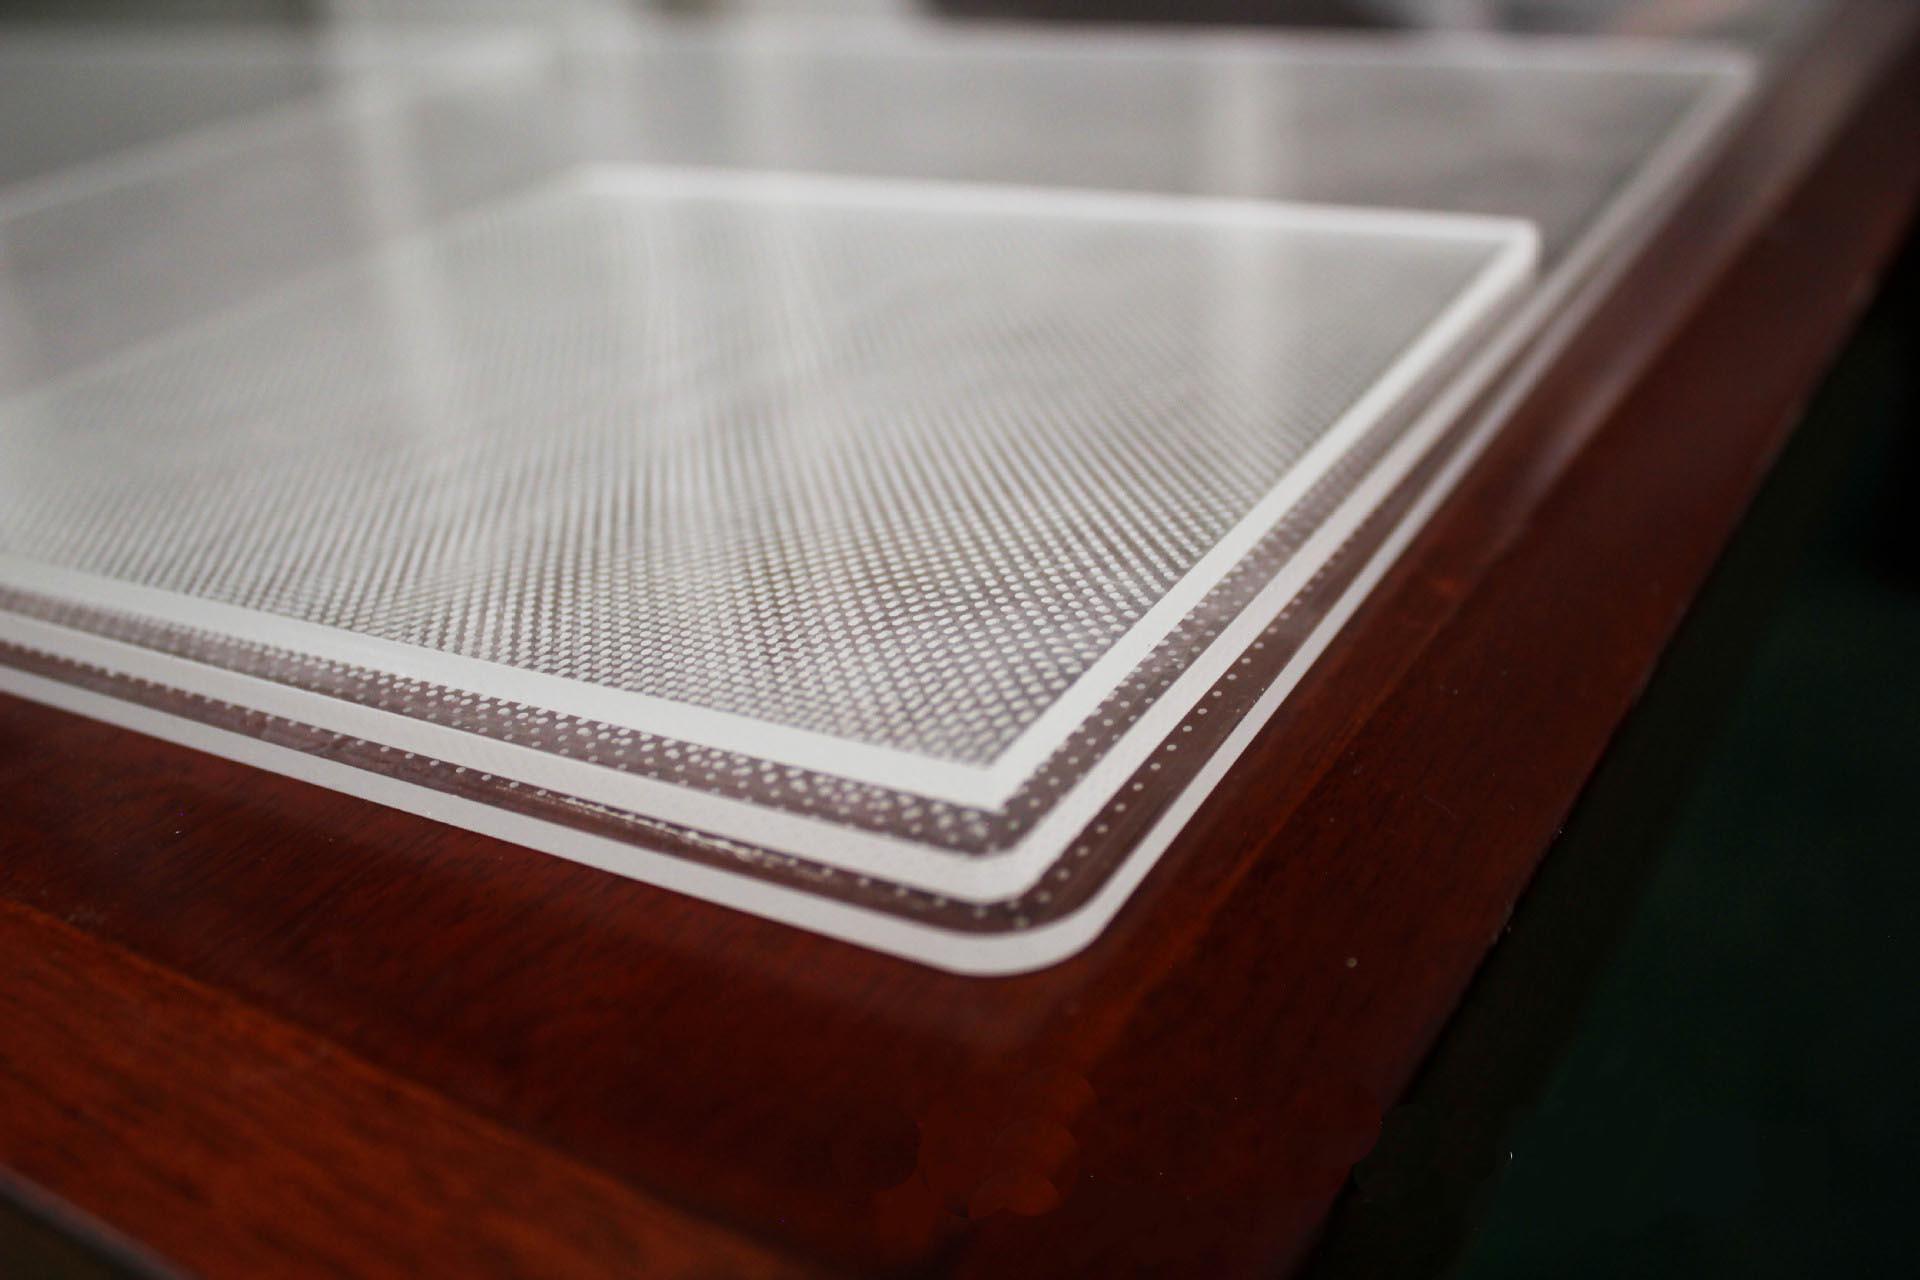 light guide plate technology